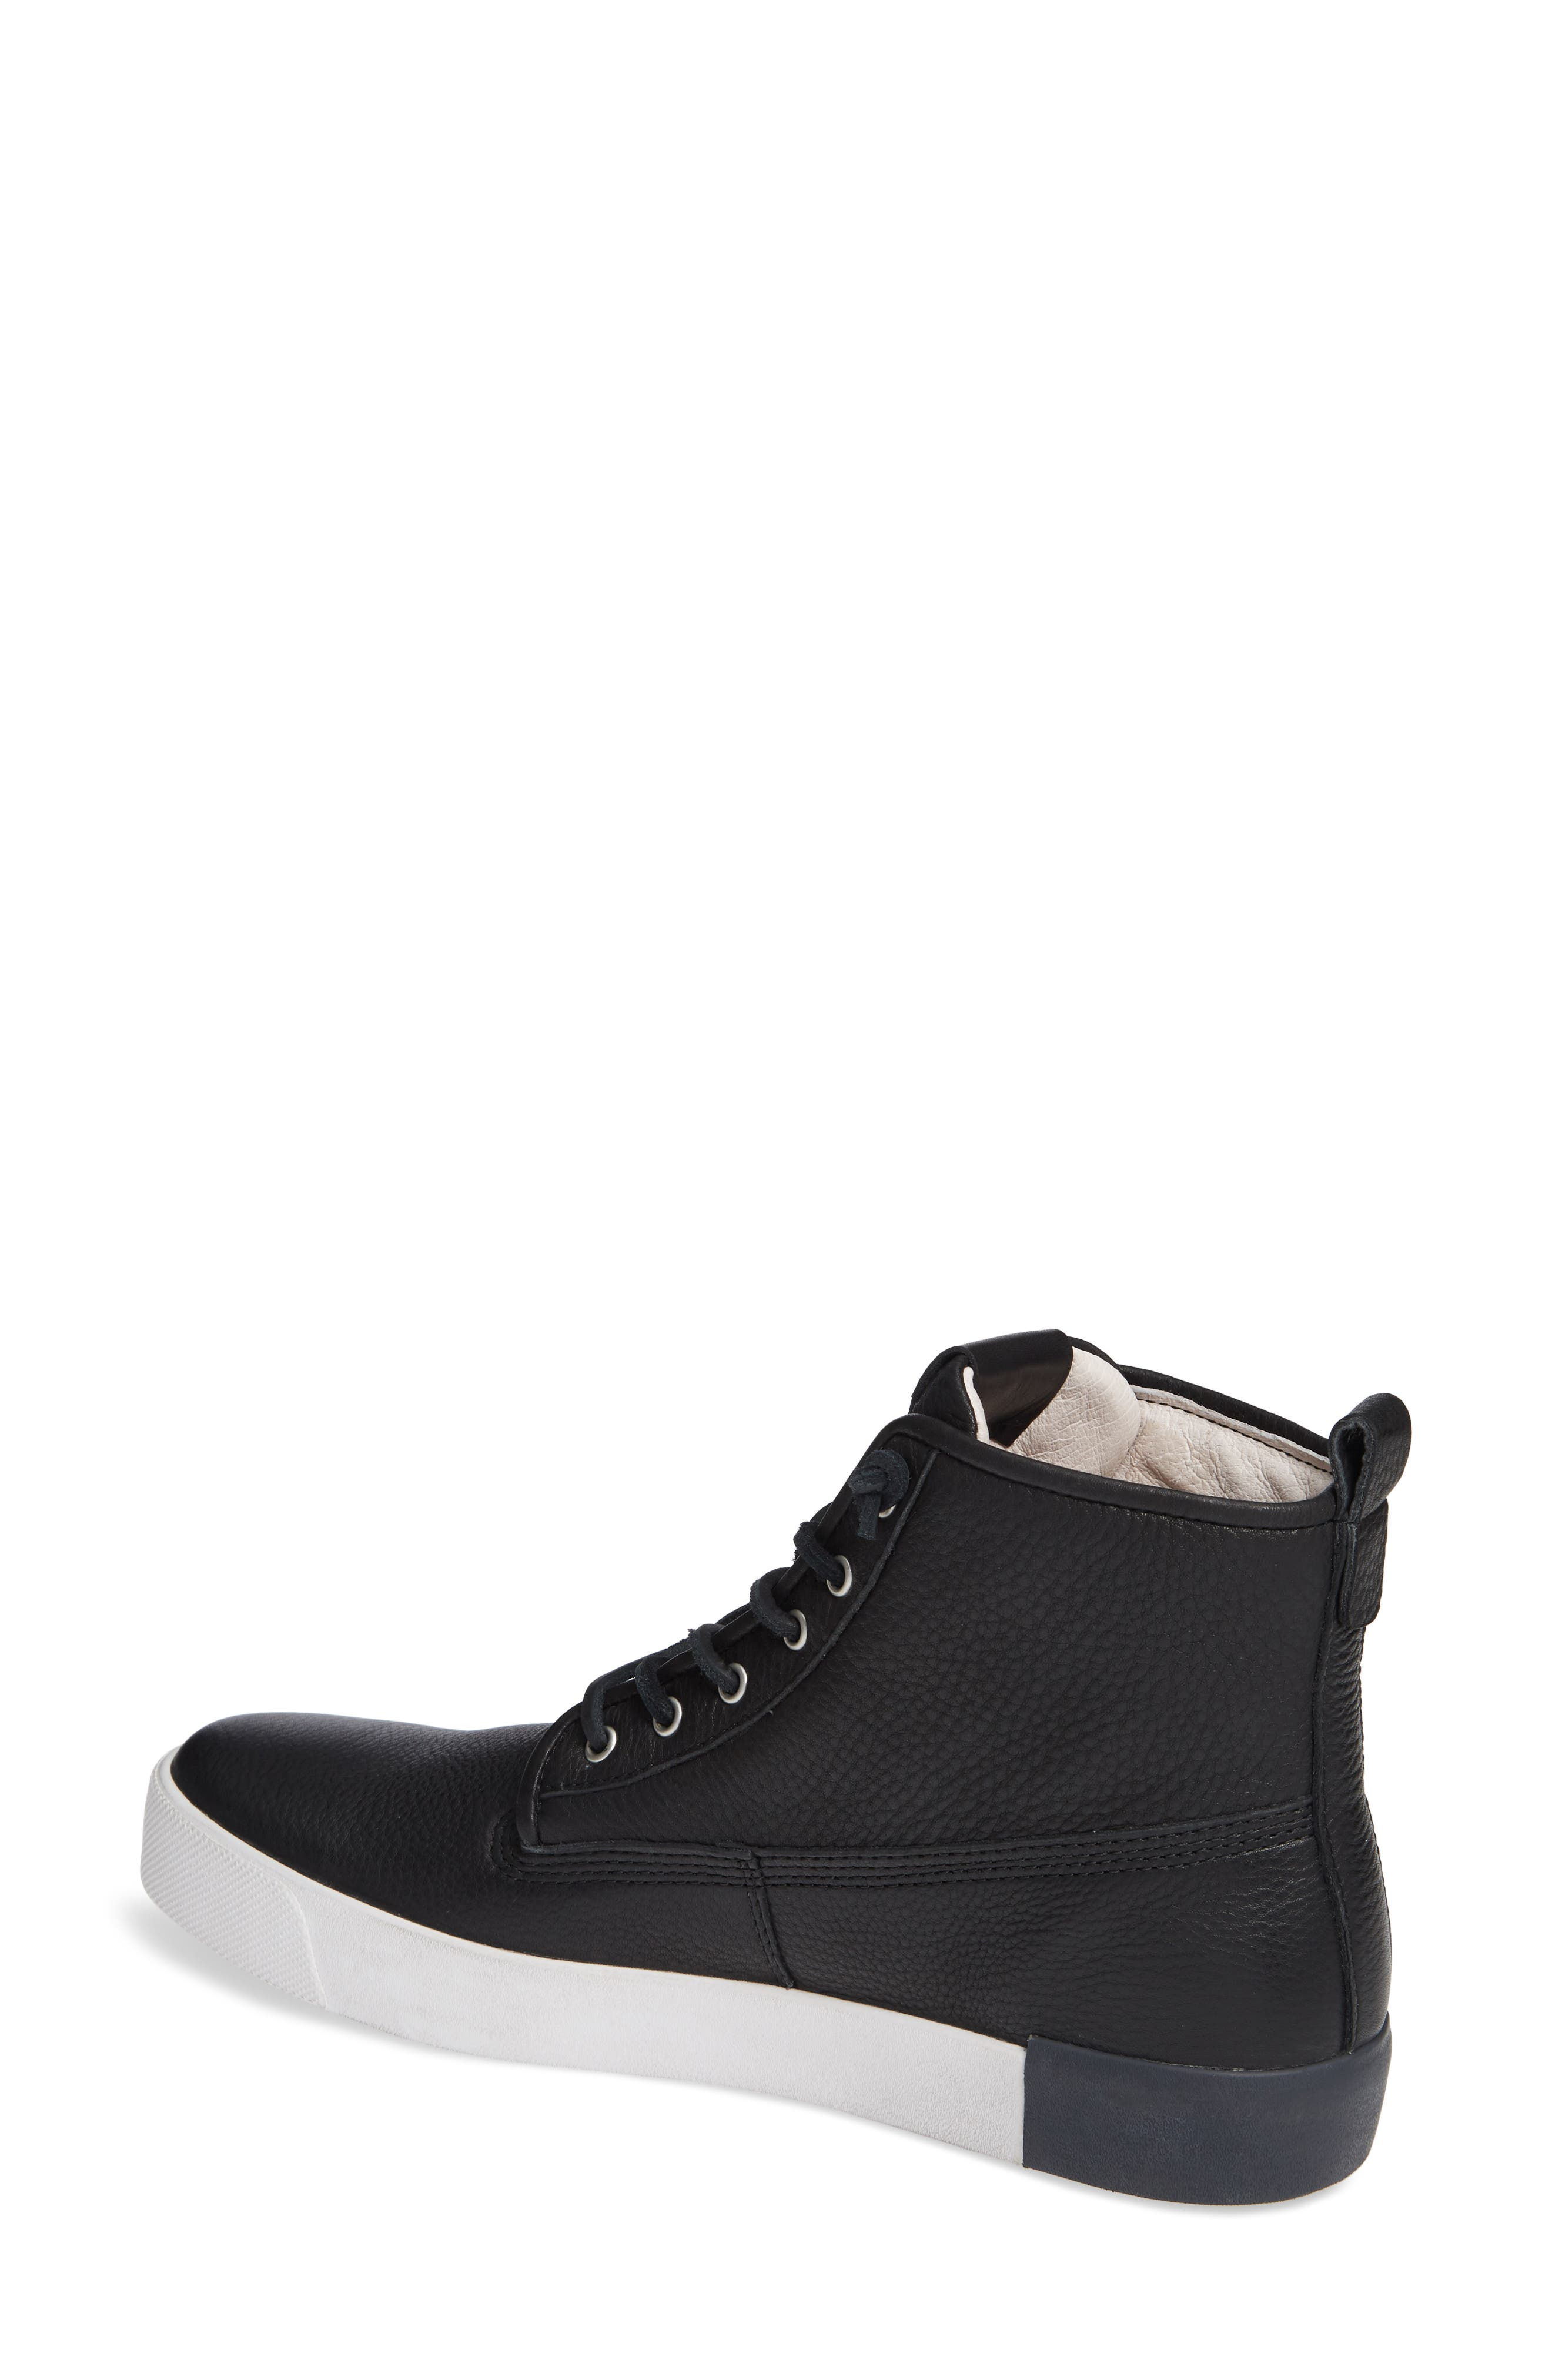 QM80 High Top Sneaker,                             Alternate thumbnail 2, color,                             BLACK